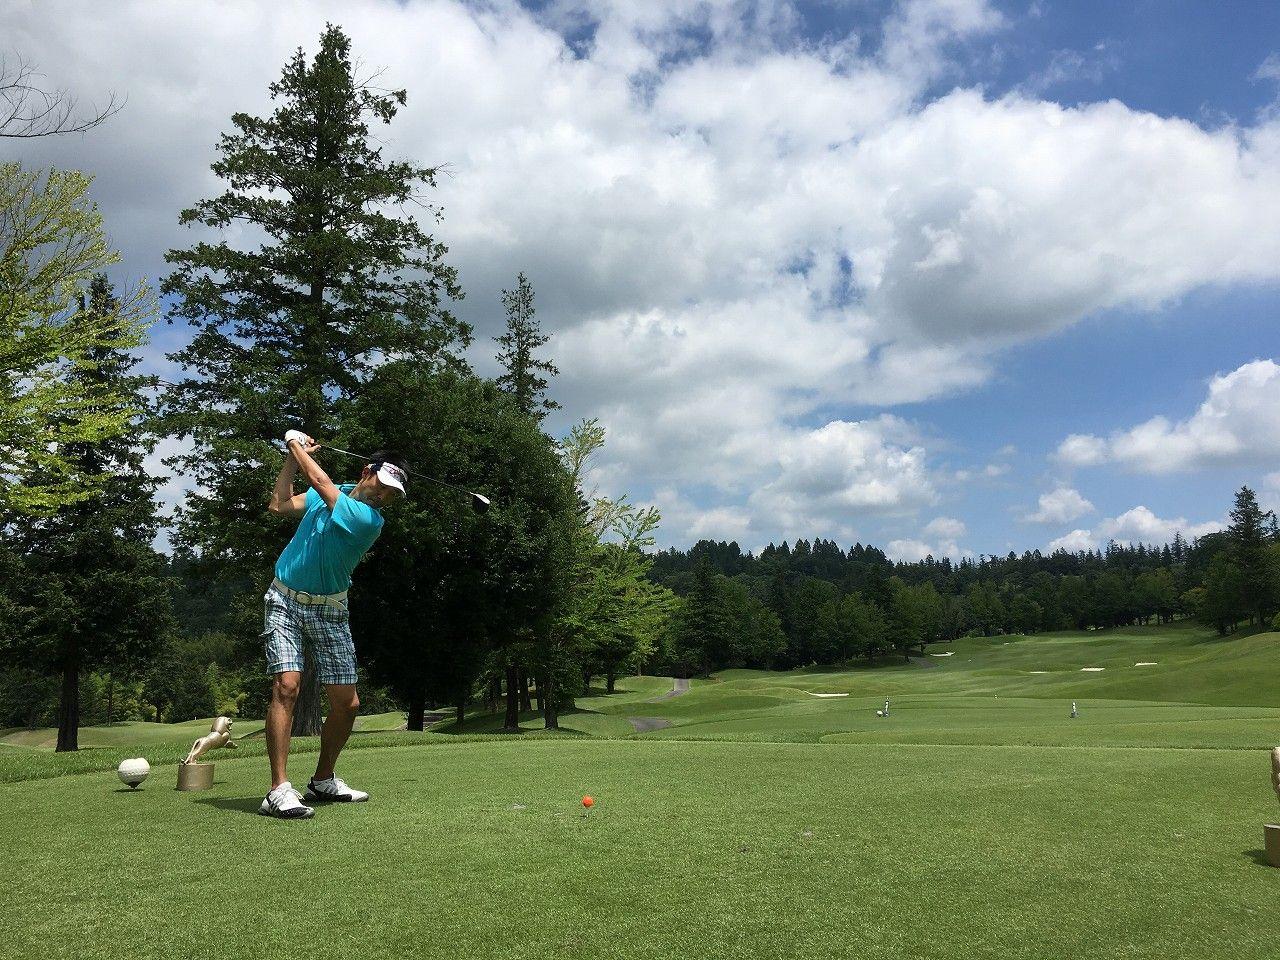 29 第二回幼馴染ゴルフ大会 11